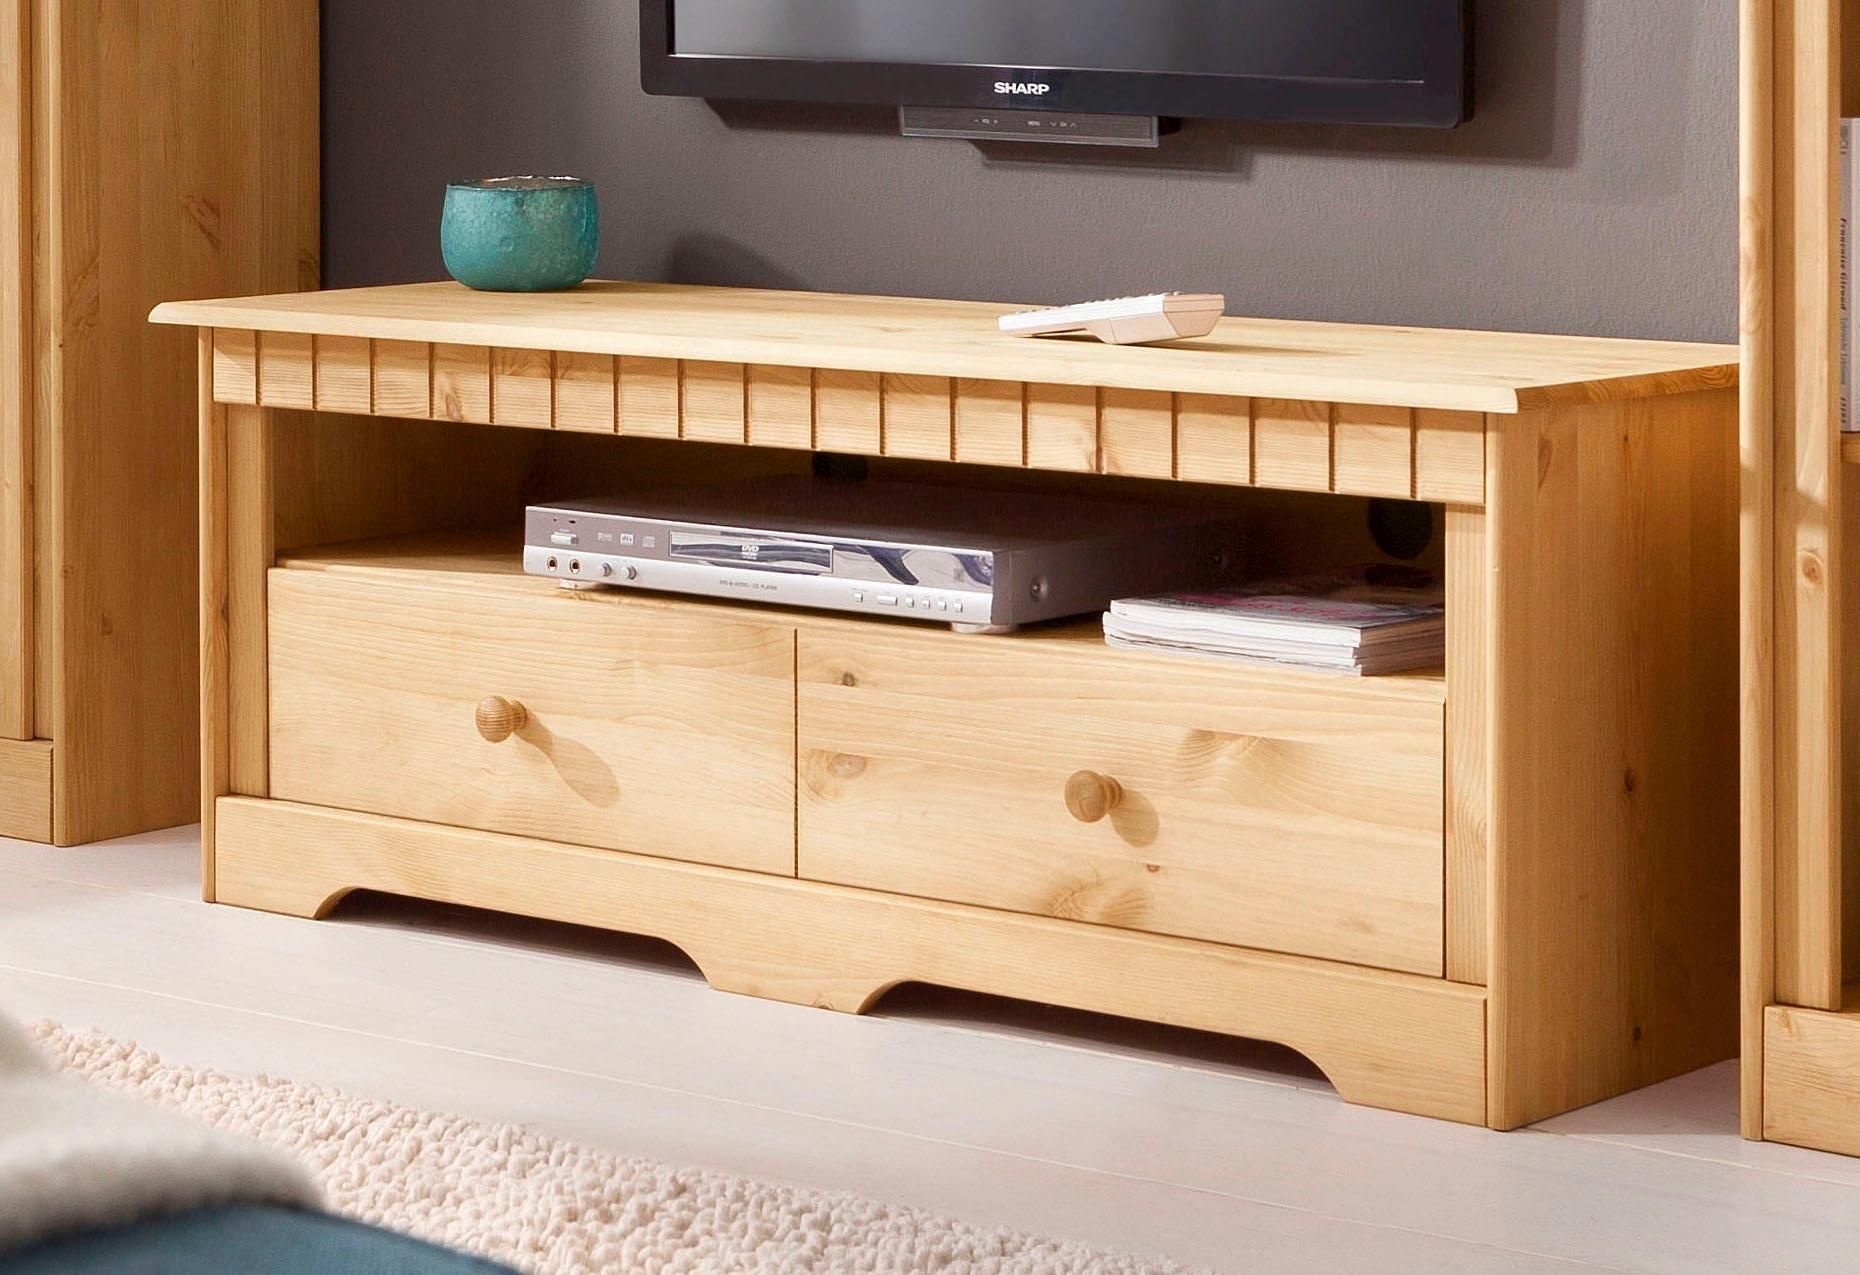 Home affaire tv-meubel Pöhl 120 cm breed online kopen op otto.nl